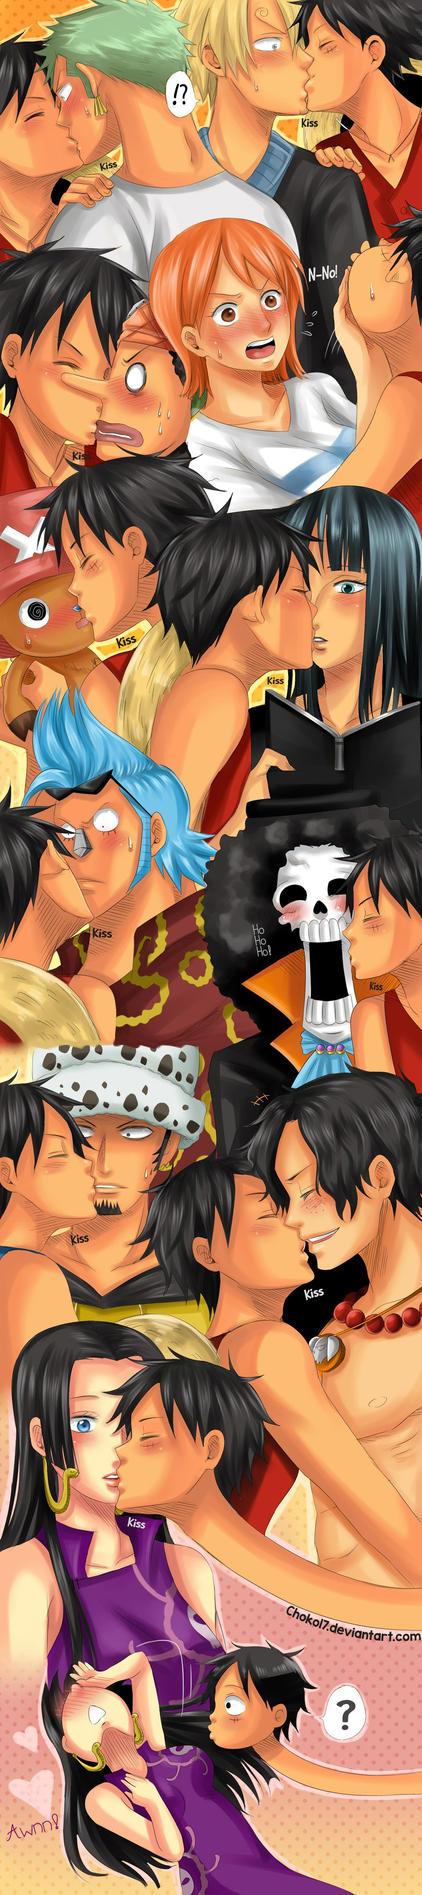 I want to kiss everyone by Choko17